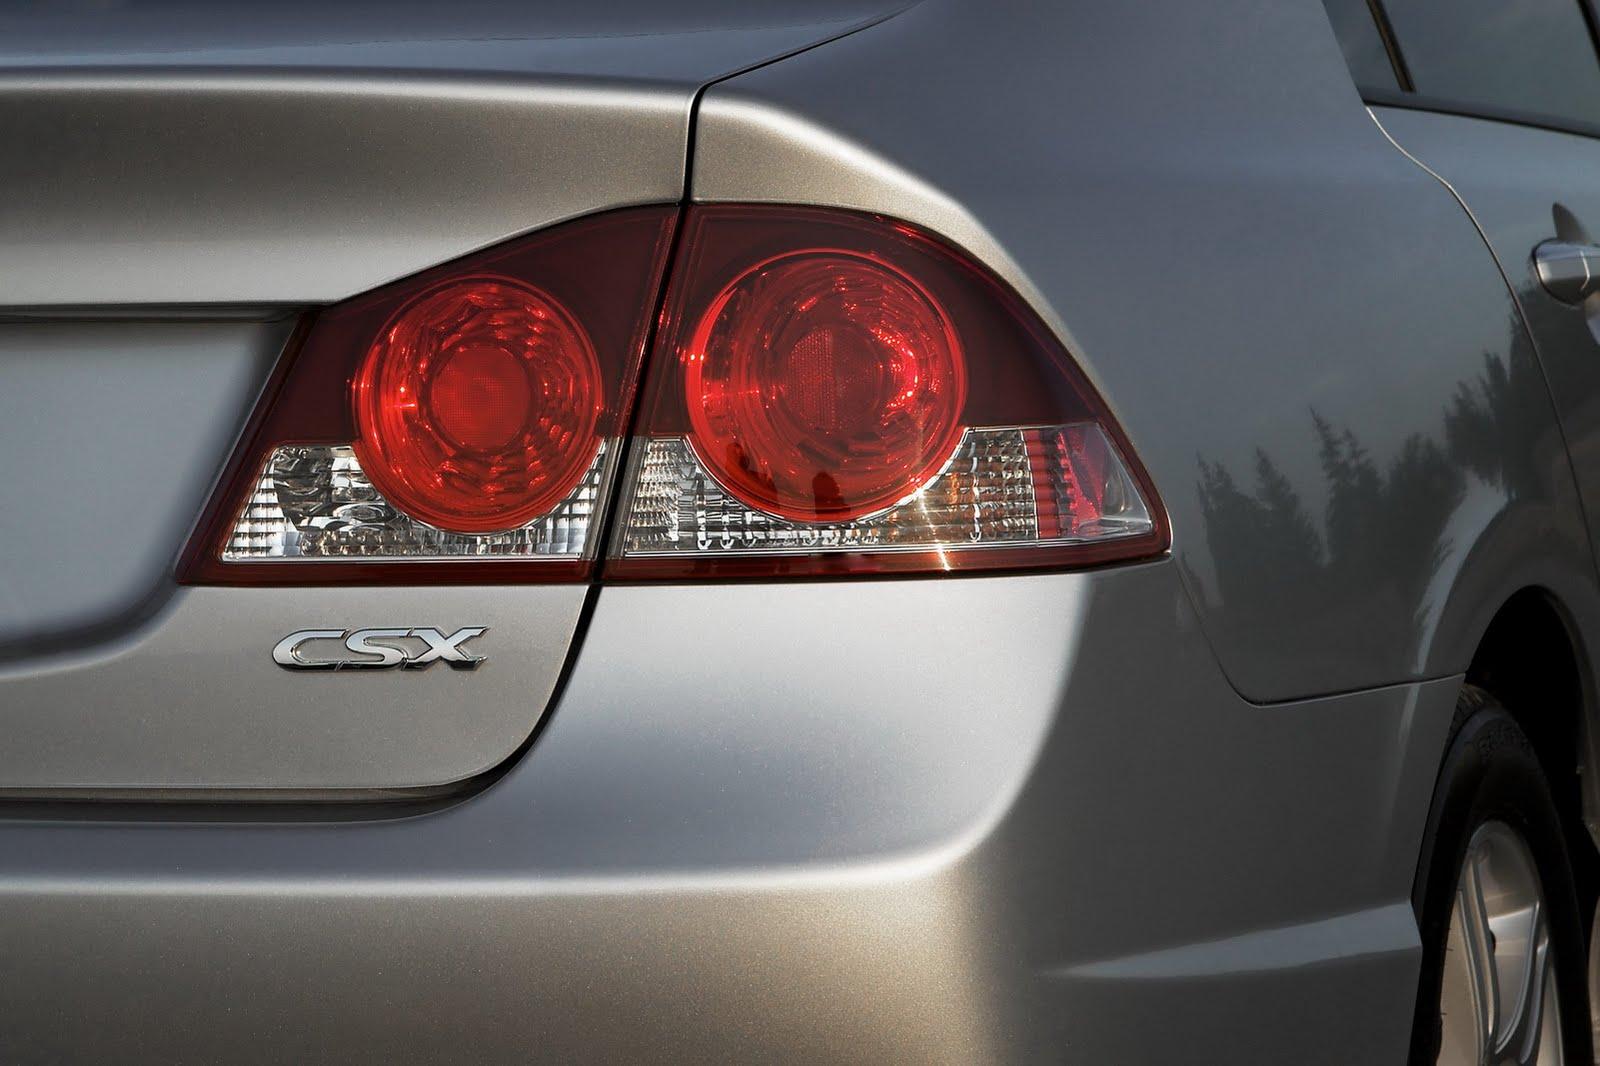 Acura CSX 2005 - 2011 Sedan #4